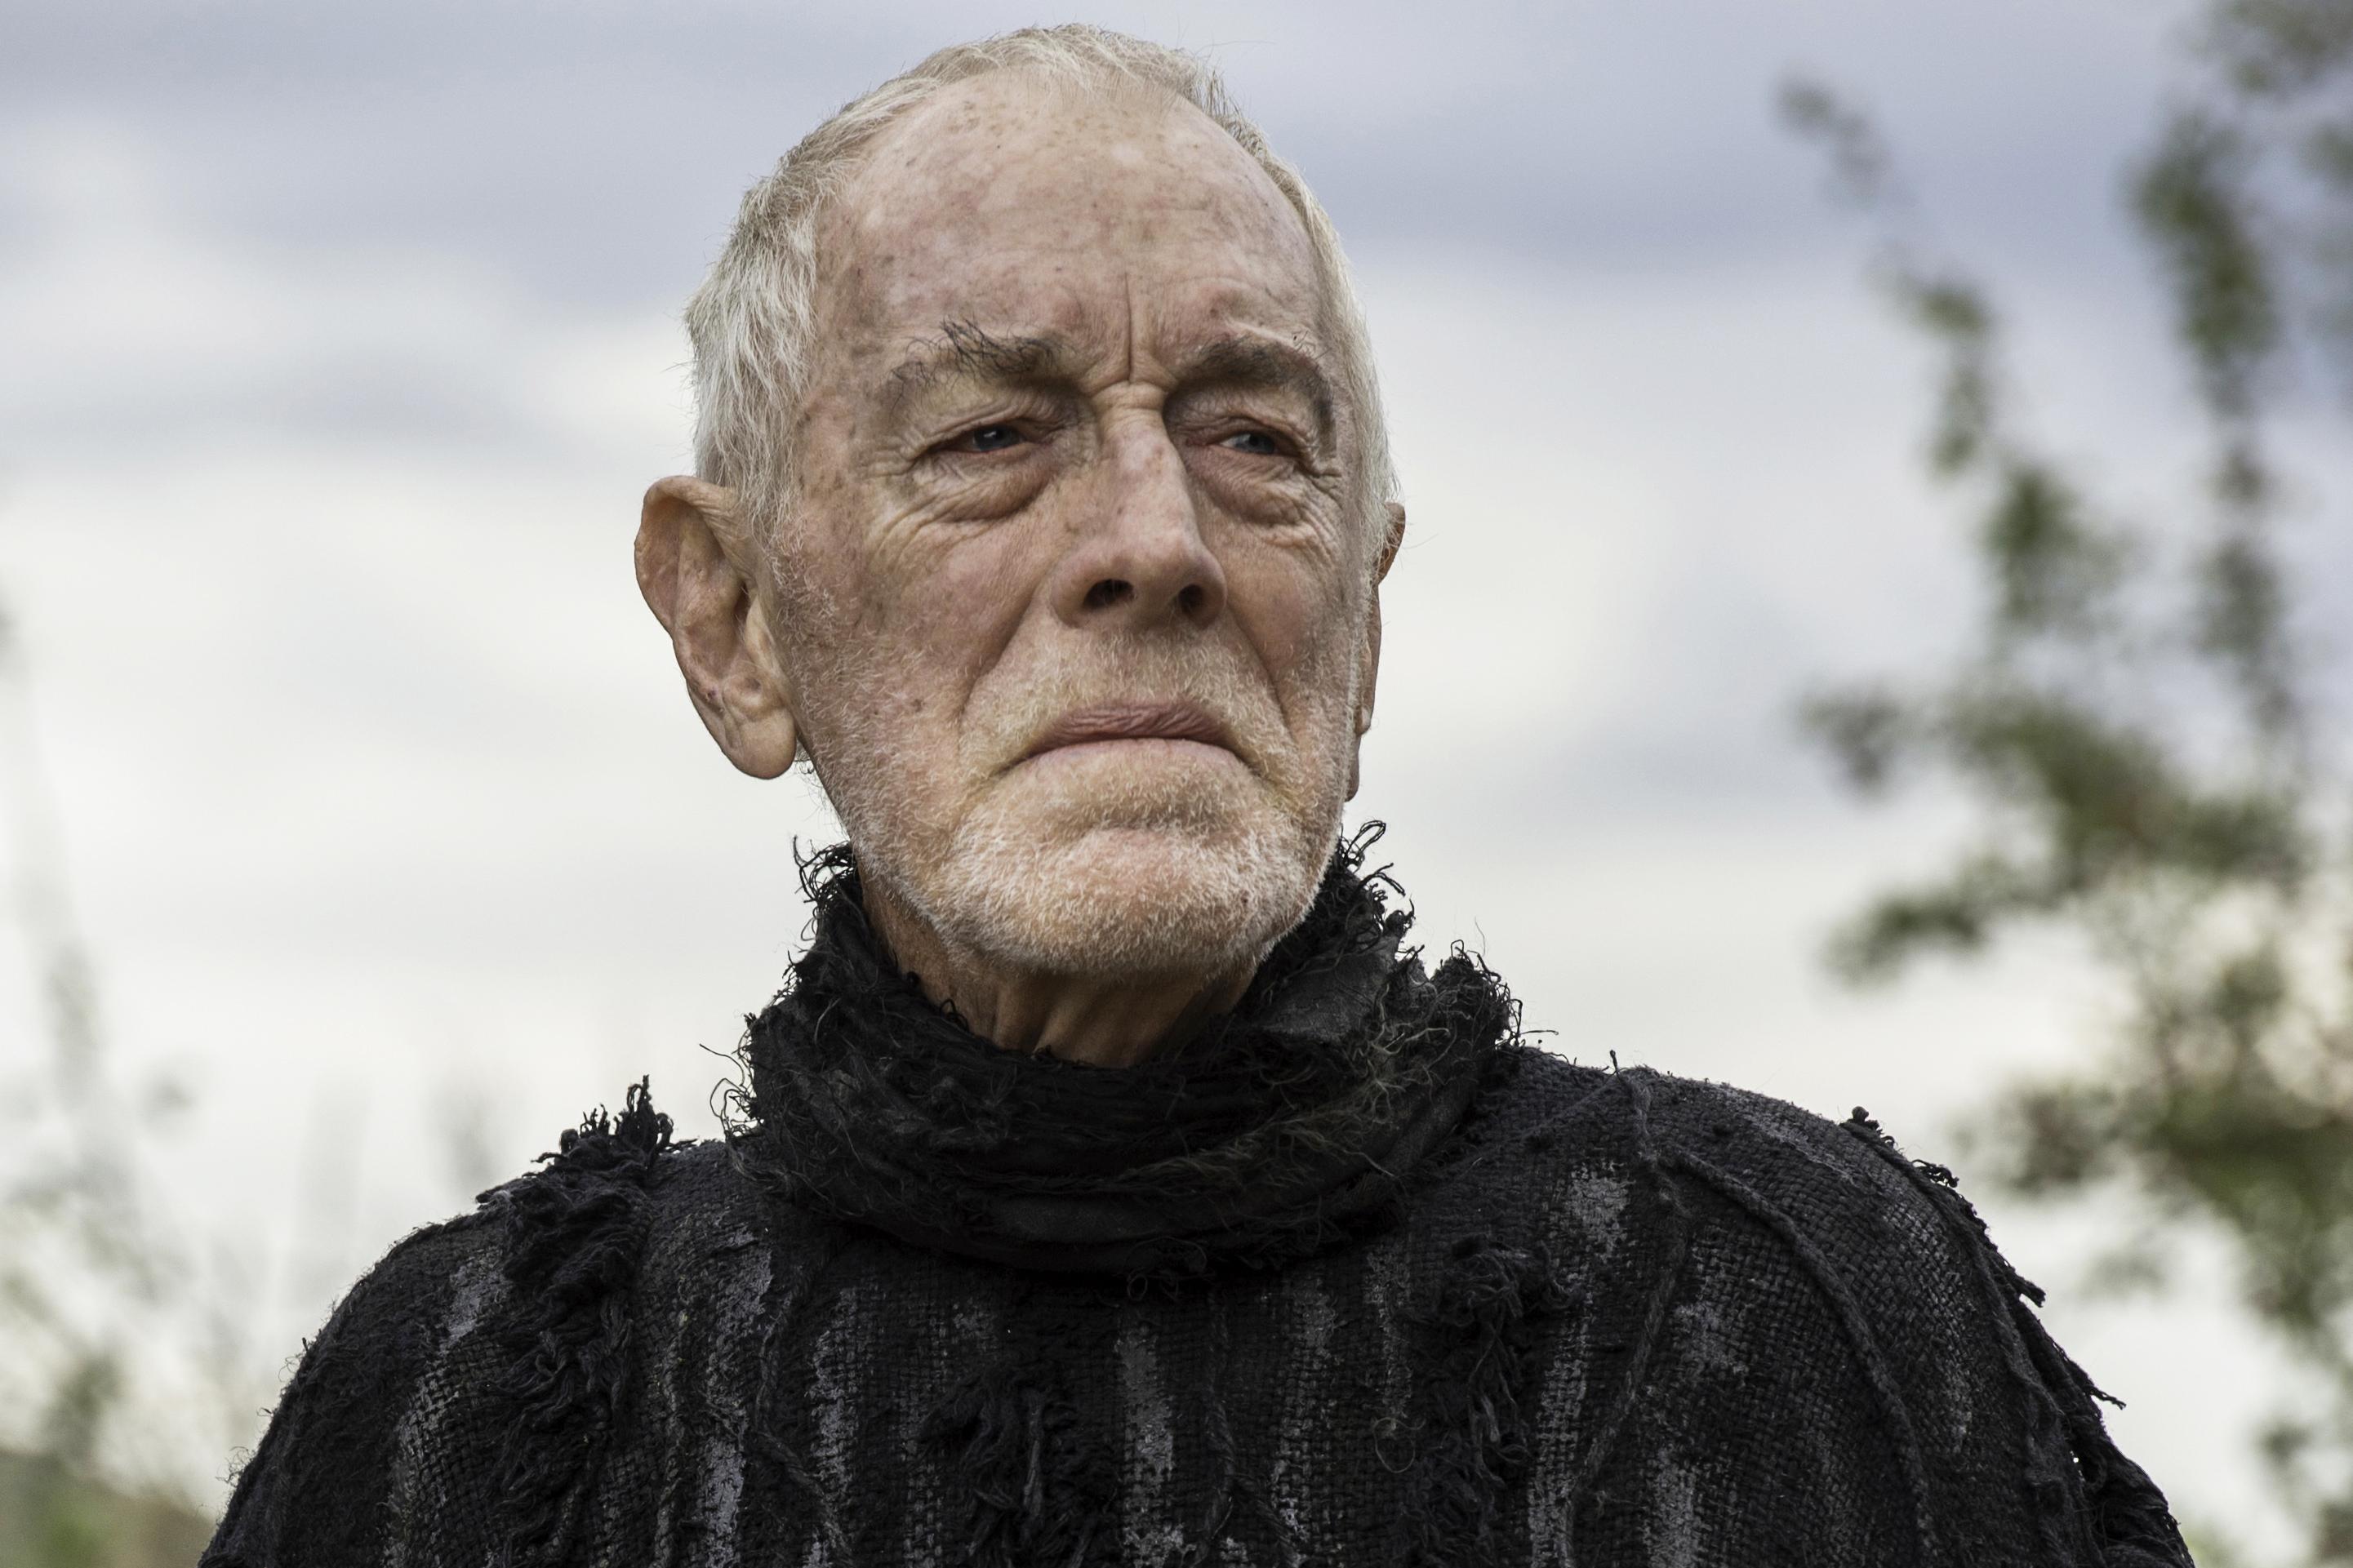 Macall B. Polay—HBO